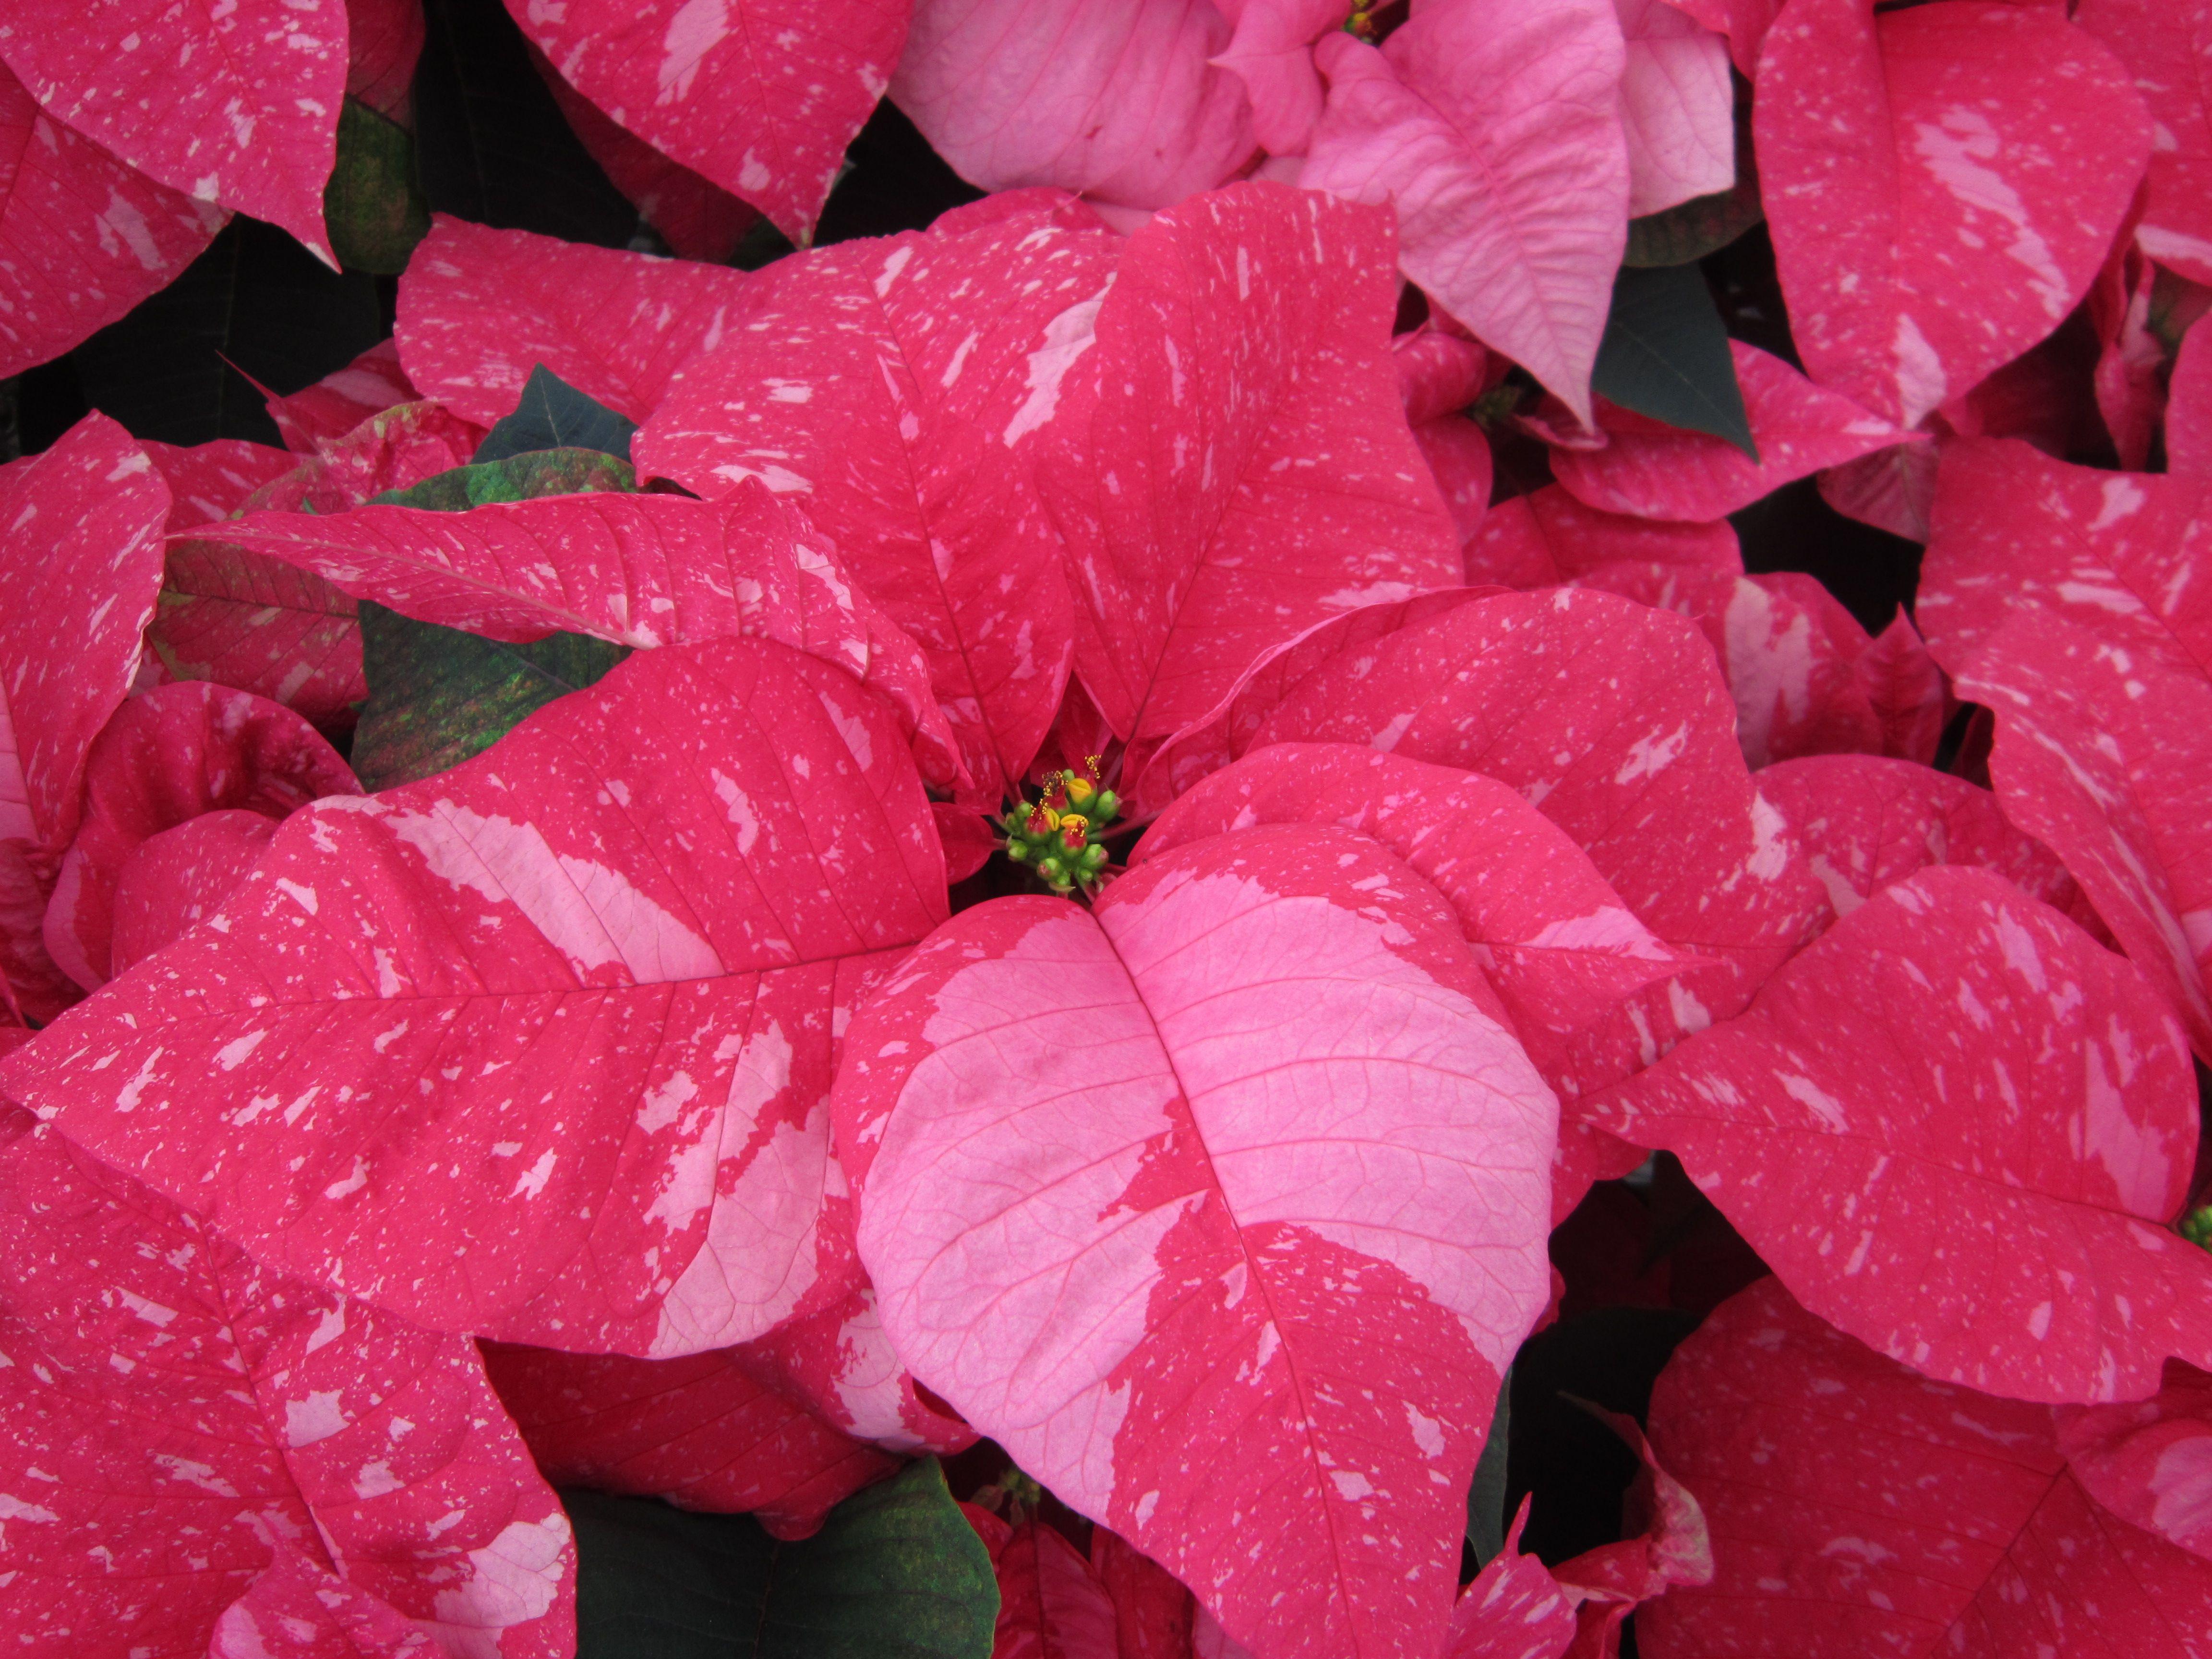 'Jubilee Jingle Bells' Poinsettia Poinsettia, Jingle